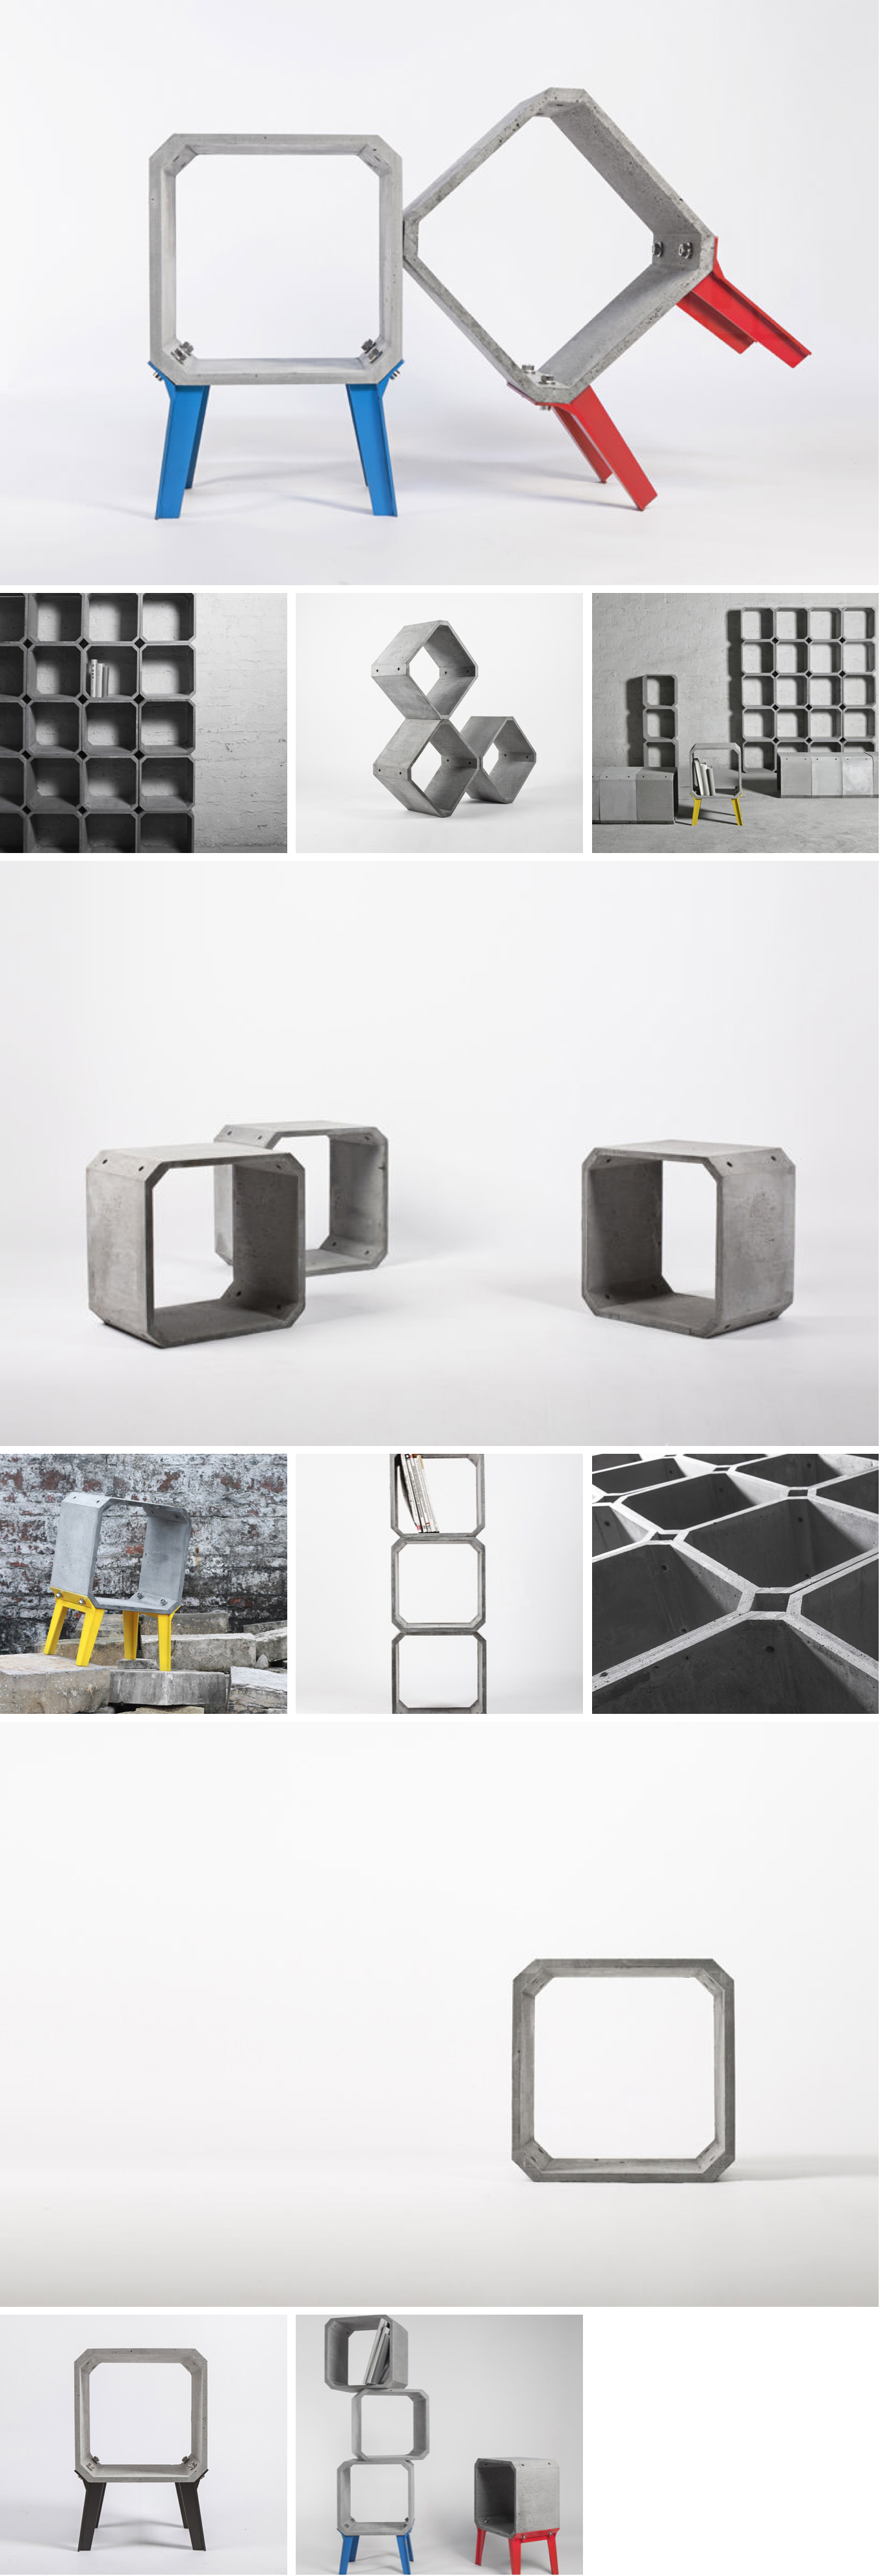 456423e301b8997b4e9ab24c435b641f Png 1354 3962 Concrete Ideas  # Muebles Cemento Liviano